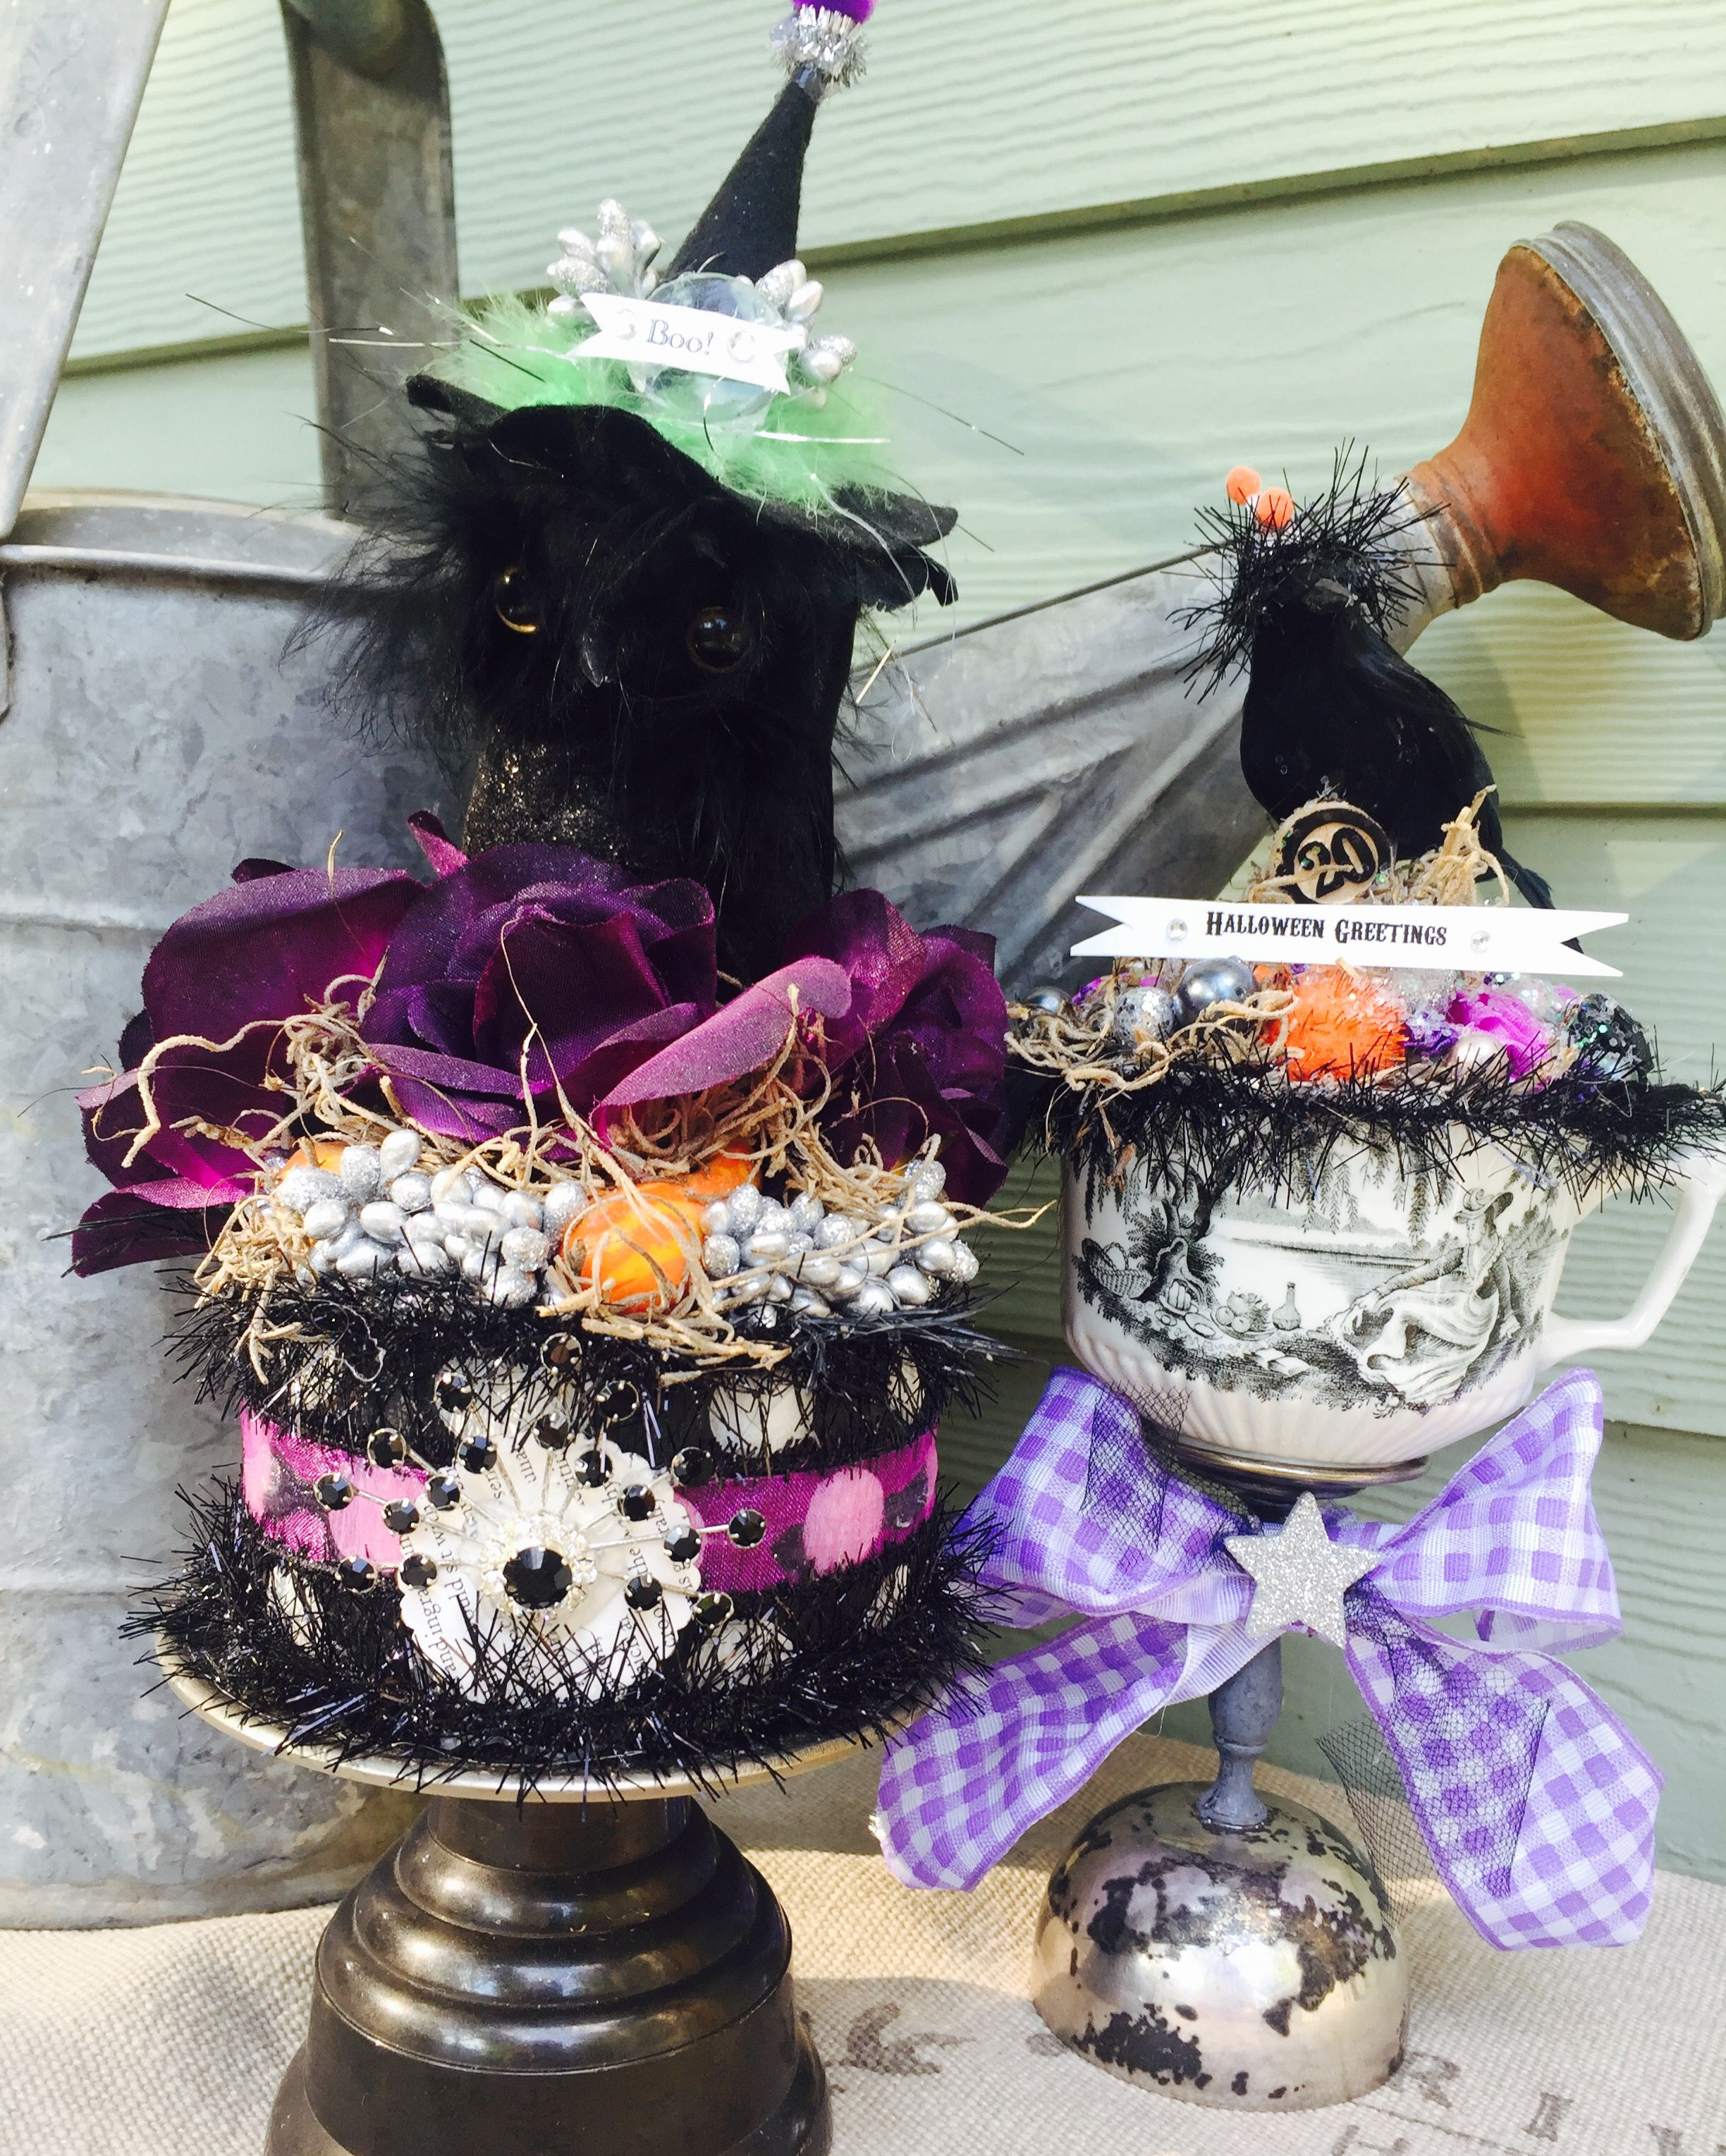 Vintage Inspired Spooky Halloween Decor; Altered Art Centerpiece - scary halloween decor